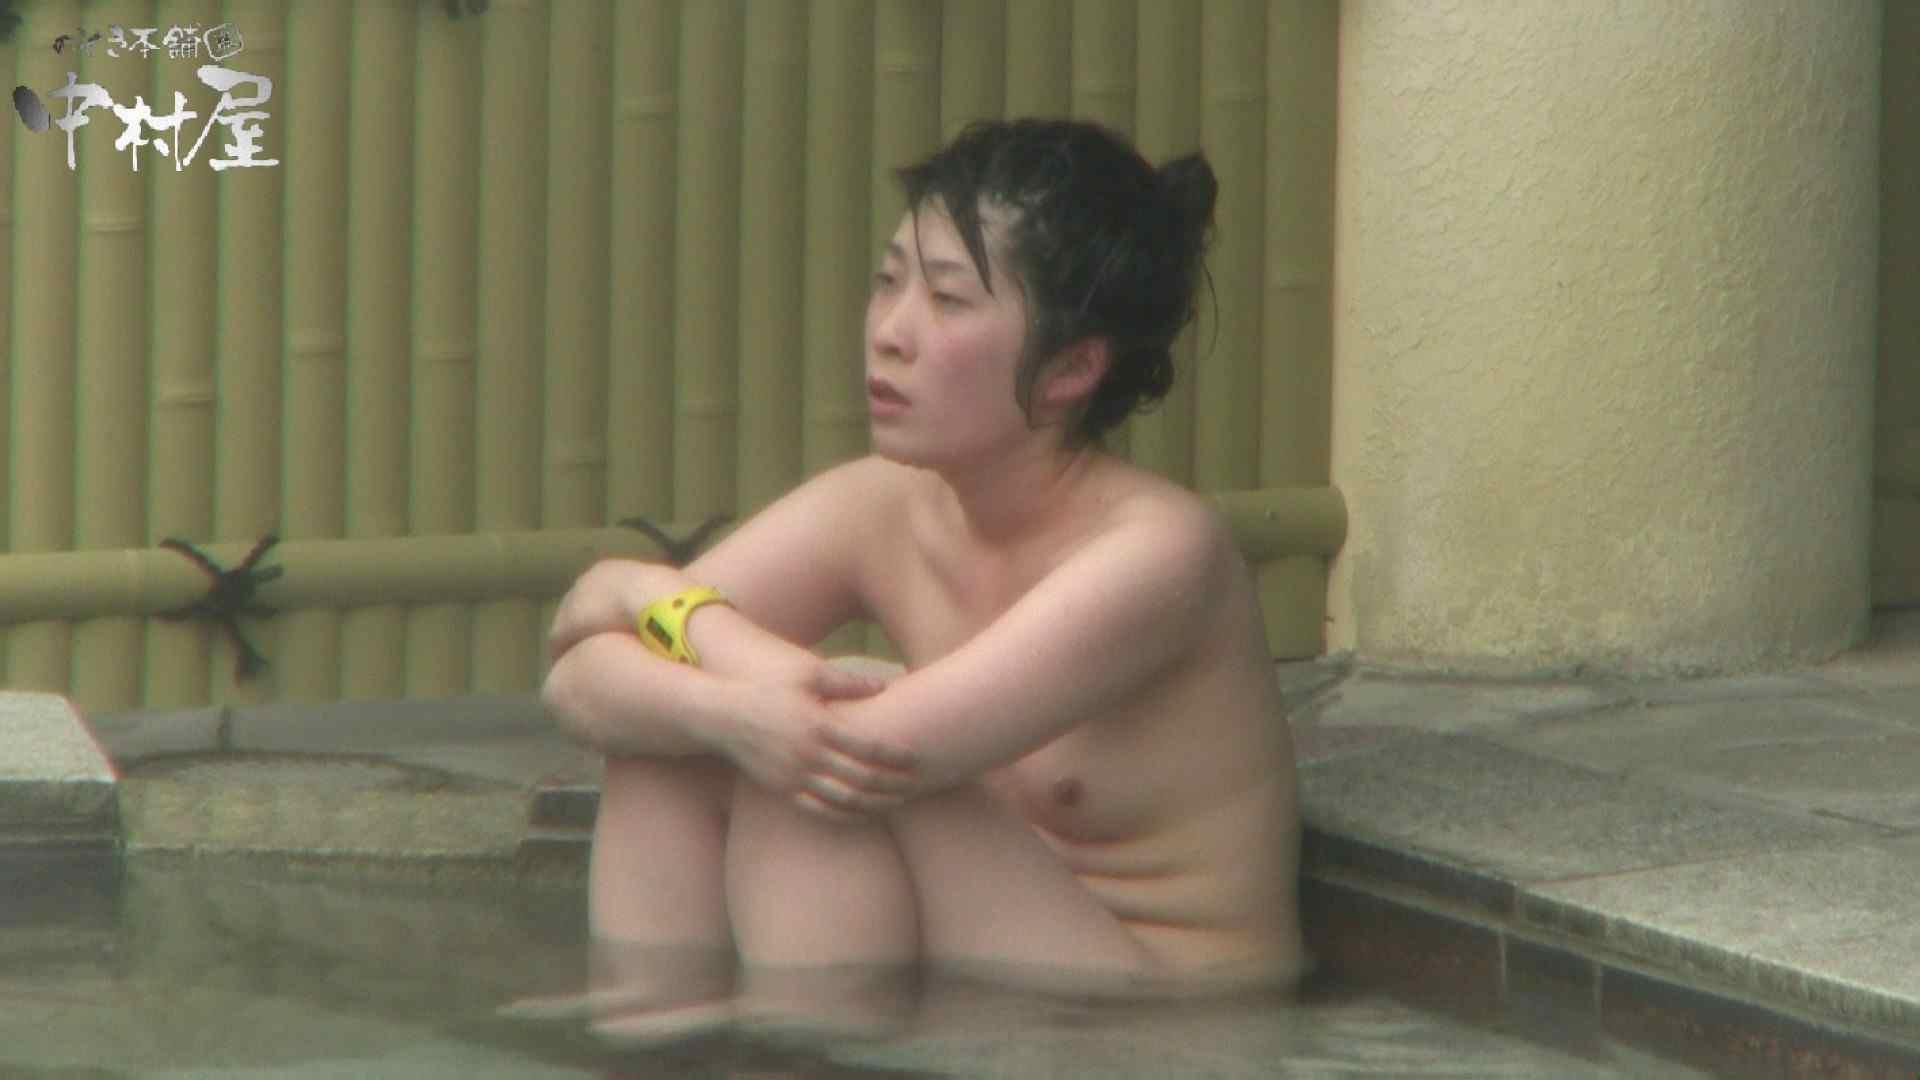 Aquaな露天風呂Vol.955 女体盗撮   OL女体  74連発 46